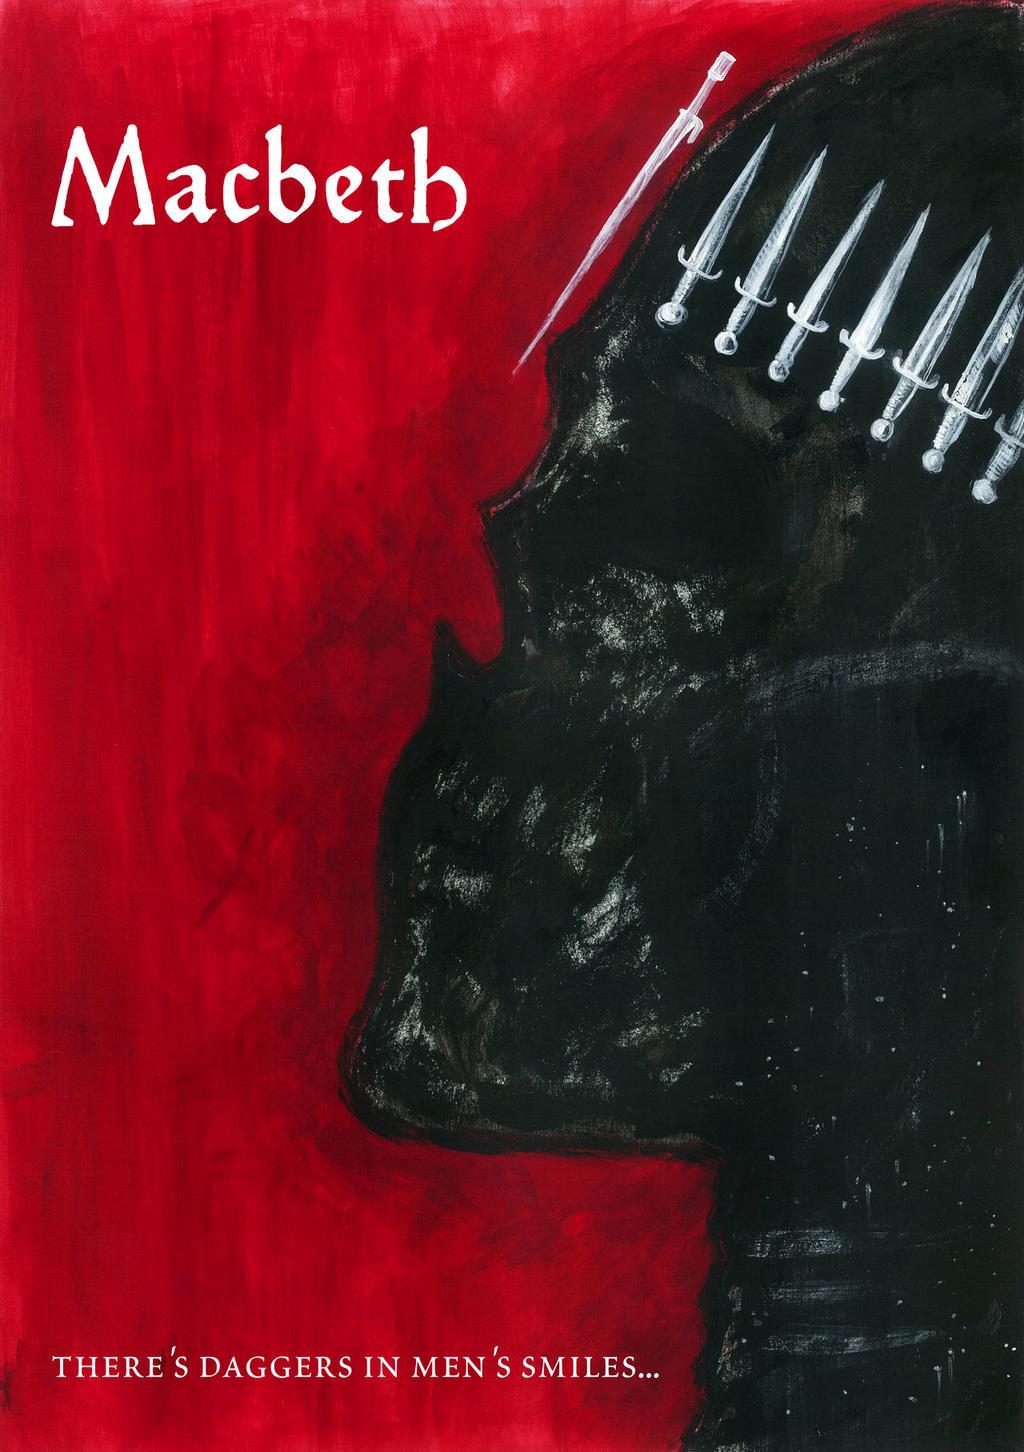 Macbeth Poster 1 by The--Procrastinator on DeviantArt